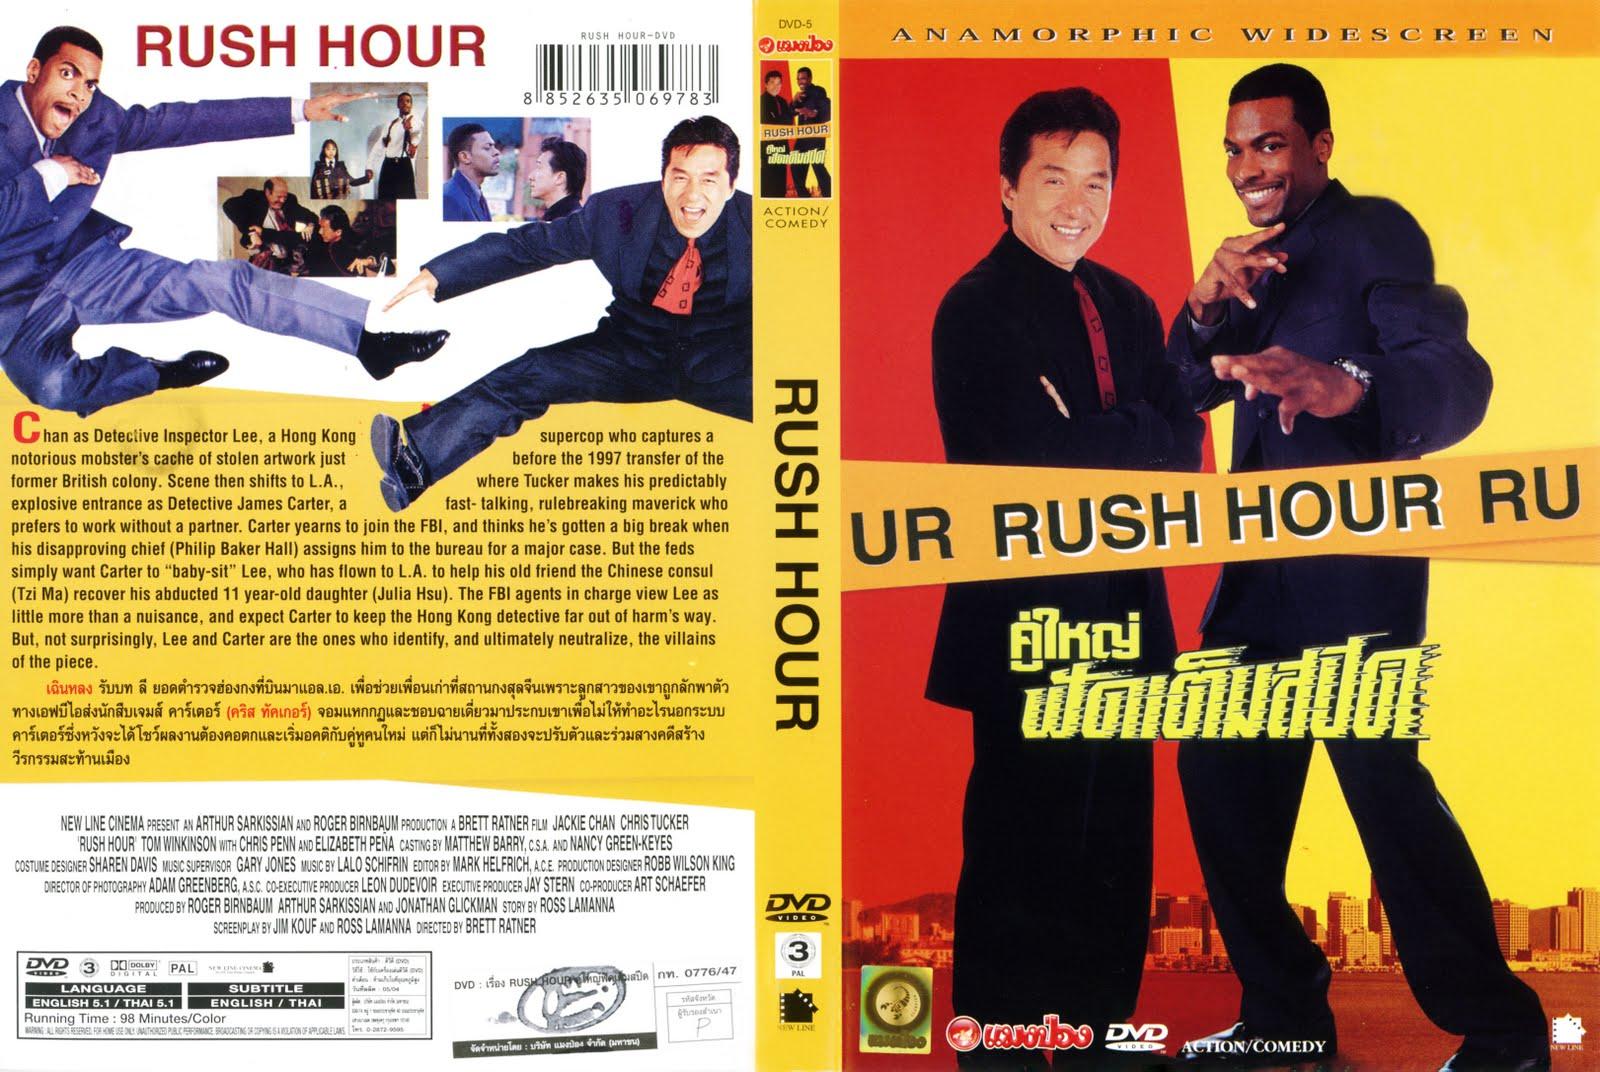 Rush Hour 1 คู่ใหญ่ฟัดเต็มสปีด 1 1998